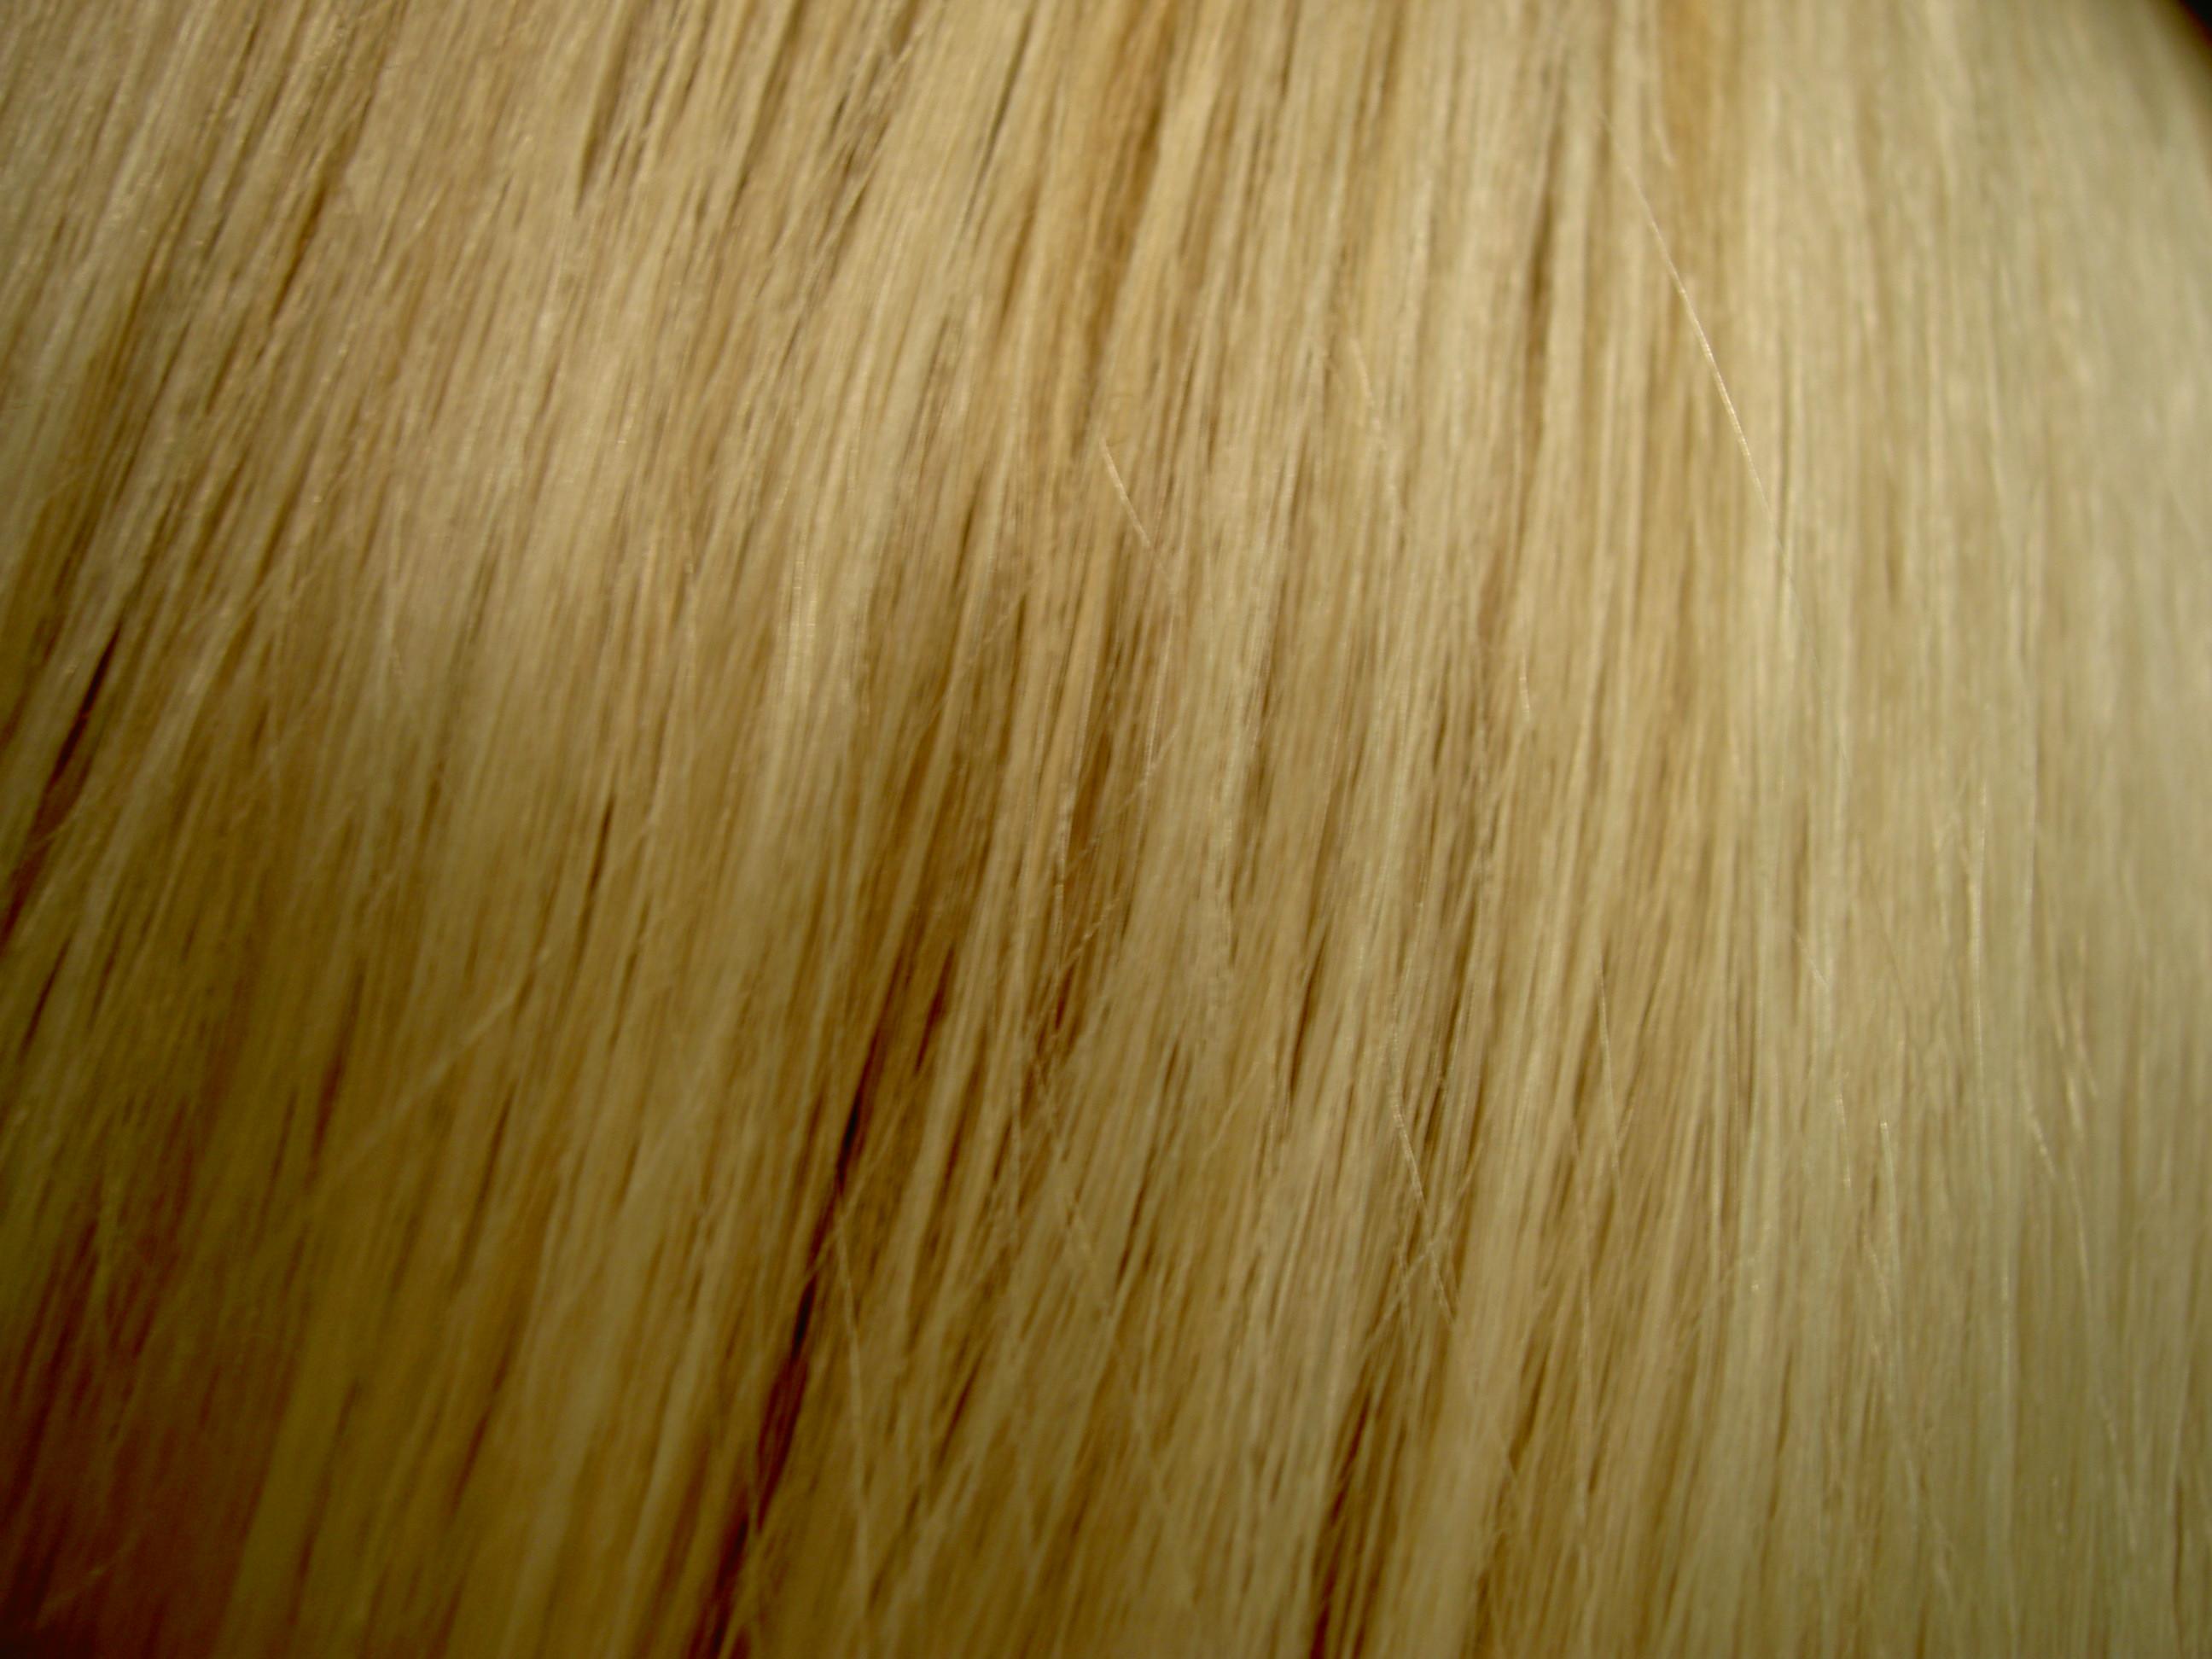 Hair-Essentials-review